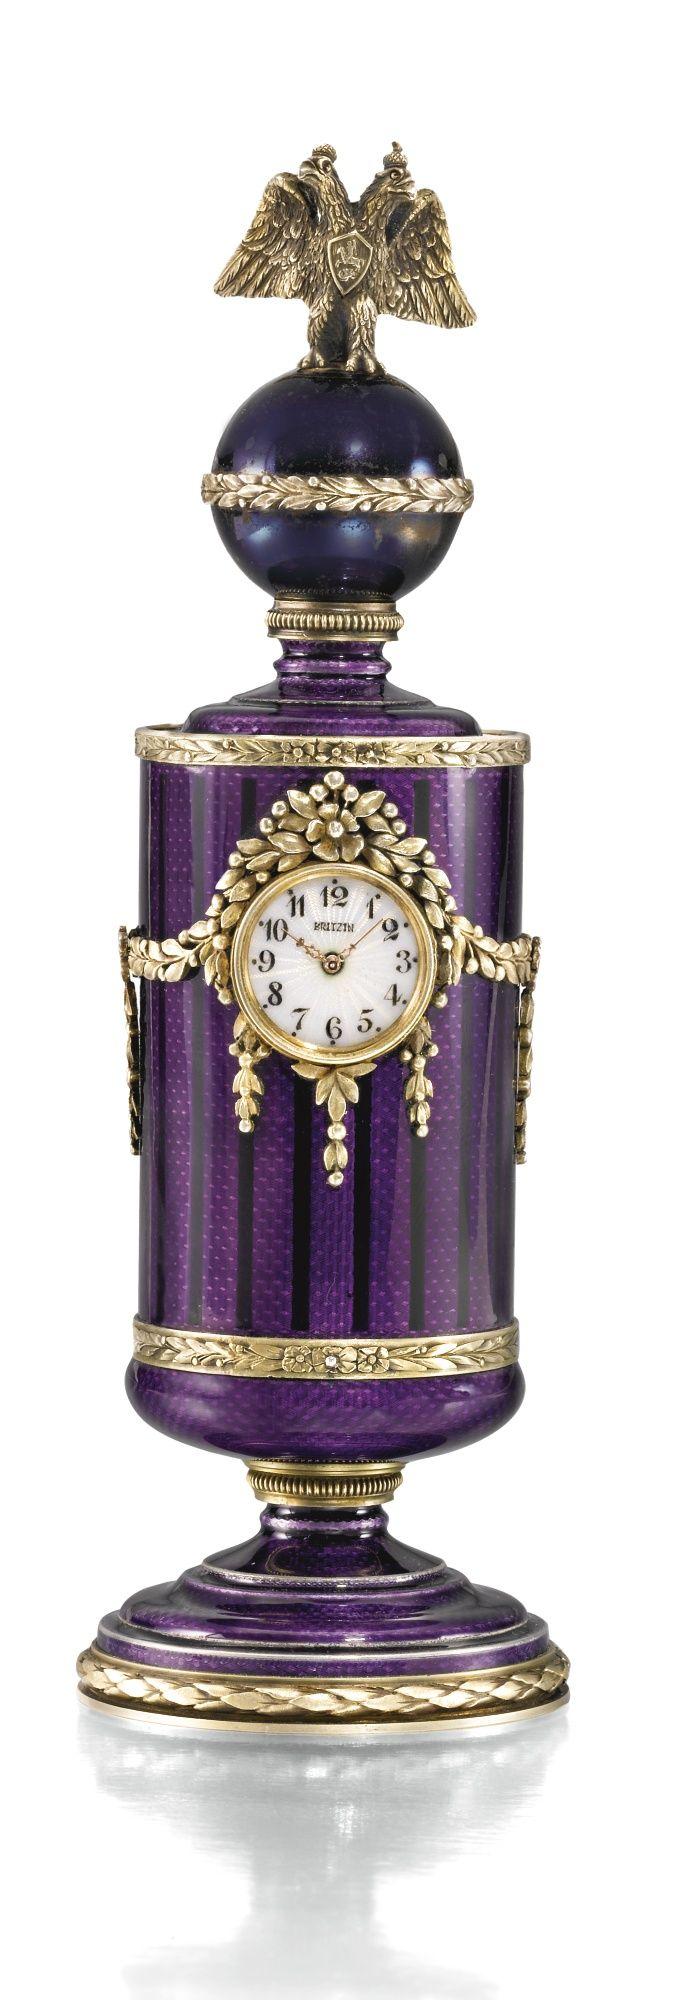 A silver-gilt and enamel timepiece, Britzen, St Petersburg, 1908-1917 | Lot | Sotheby's